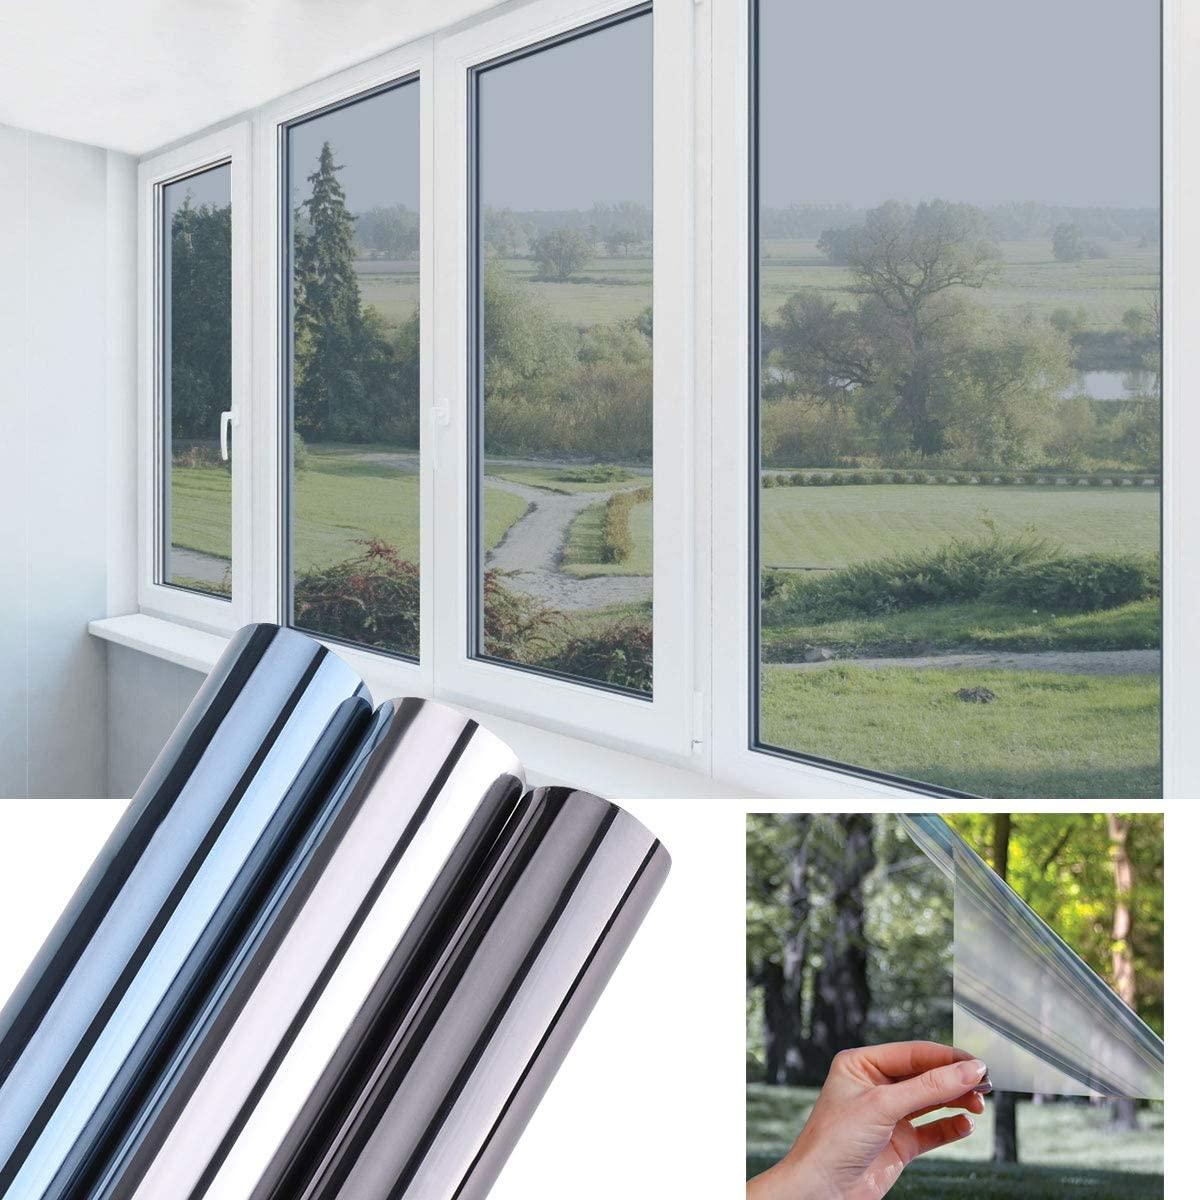 LUCKYYJ Privacy Window Film Sun Blocking Mirror Reflective Window Tint Self-adhesive Film Heat Control Anti UV Window Stickers